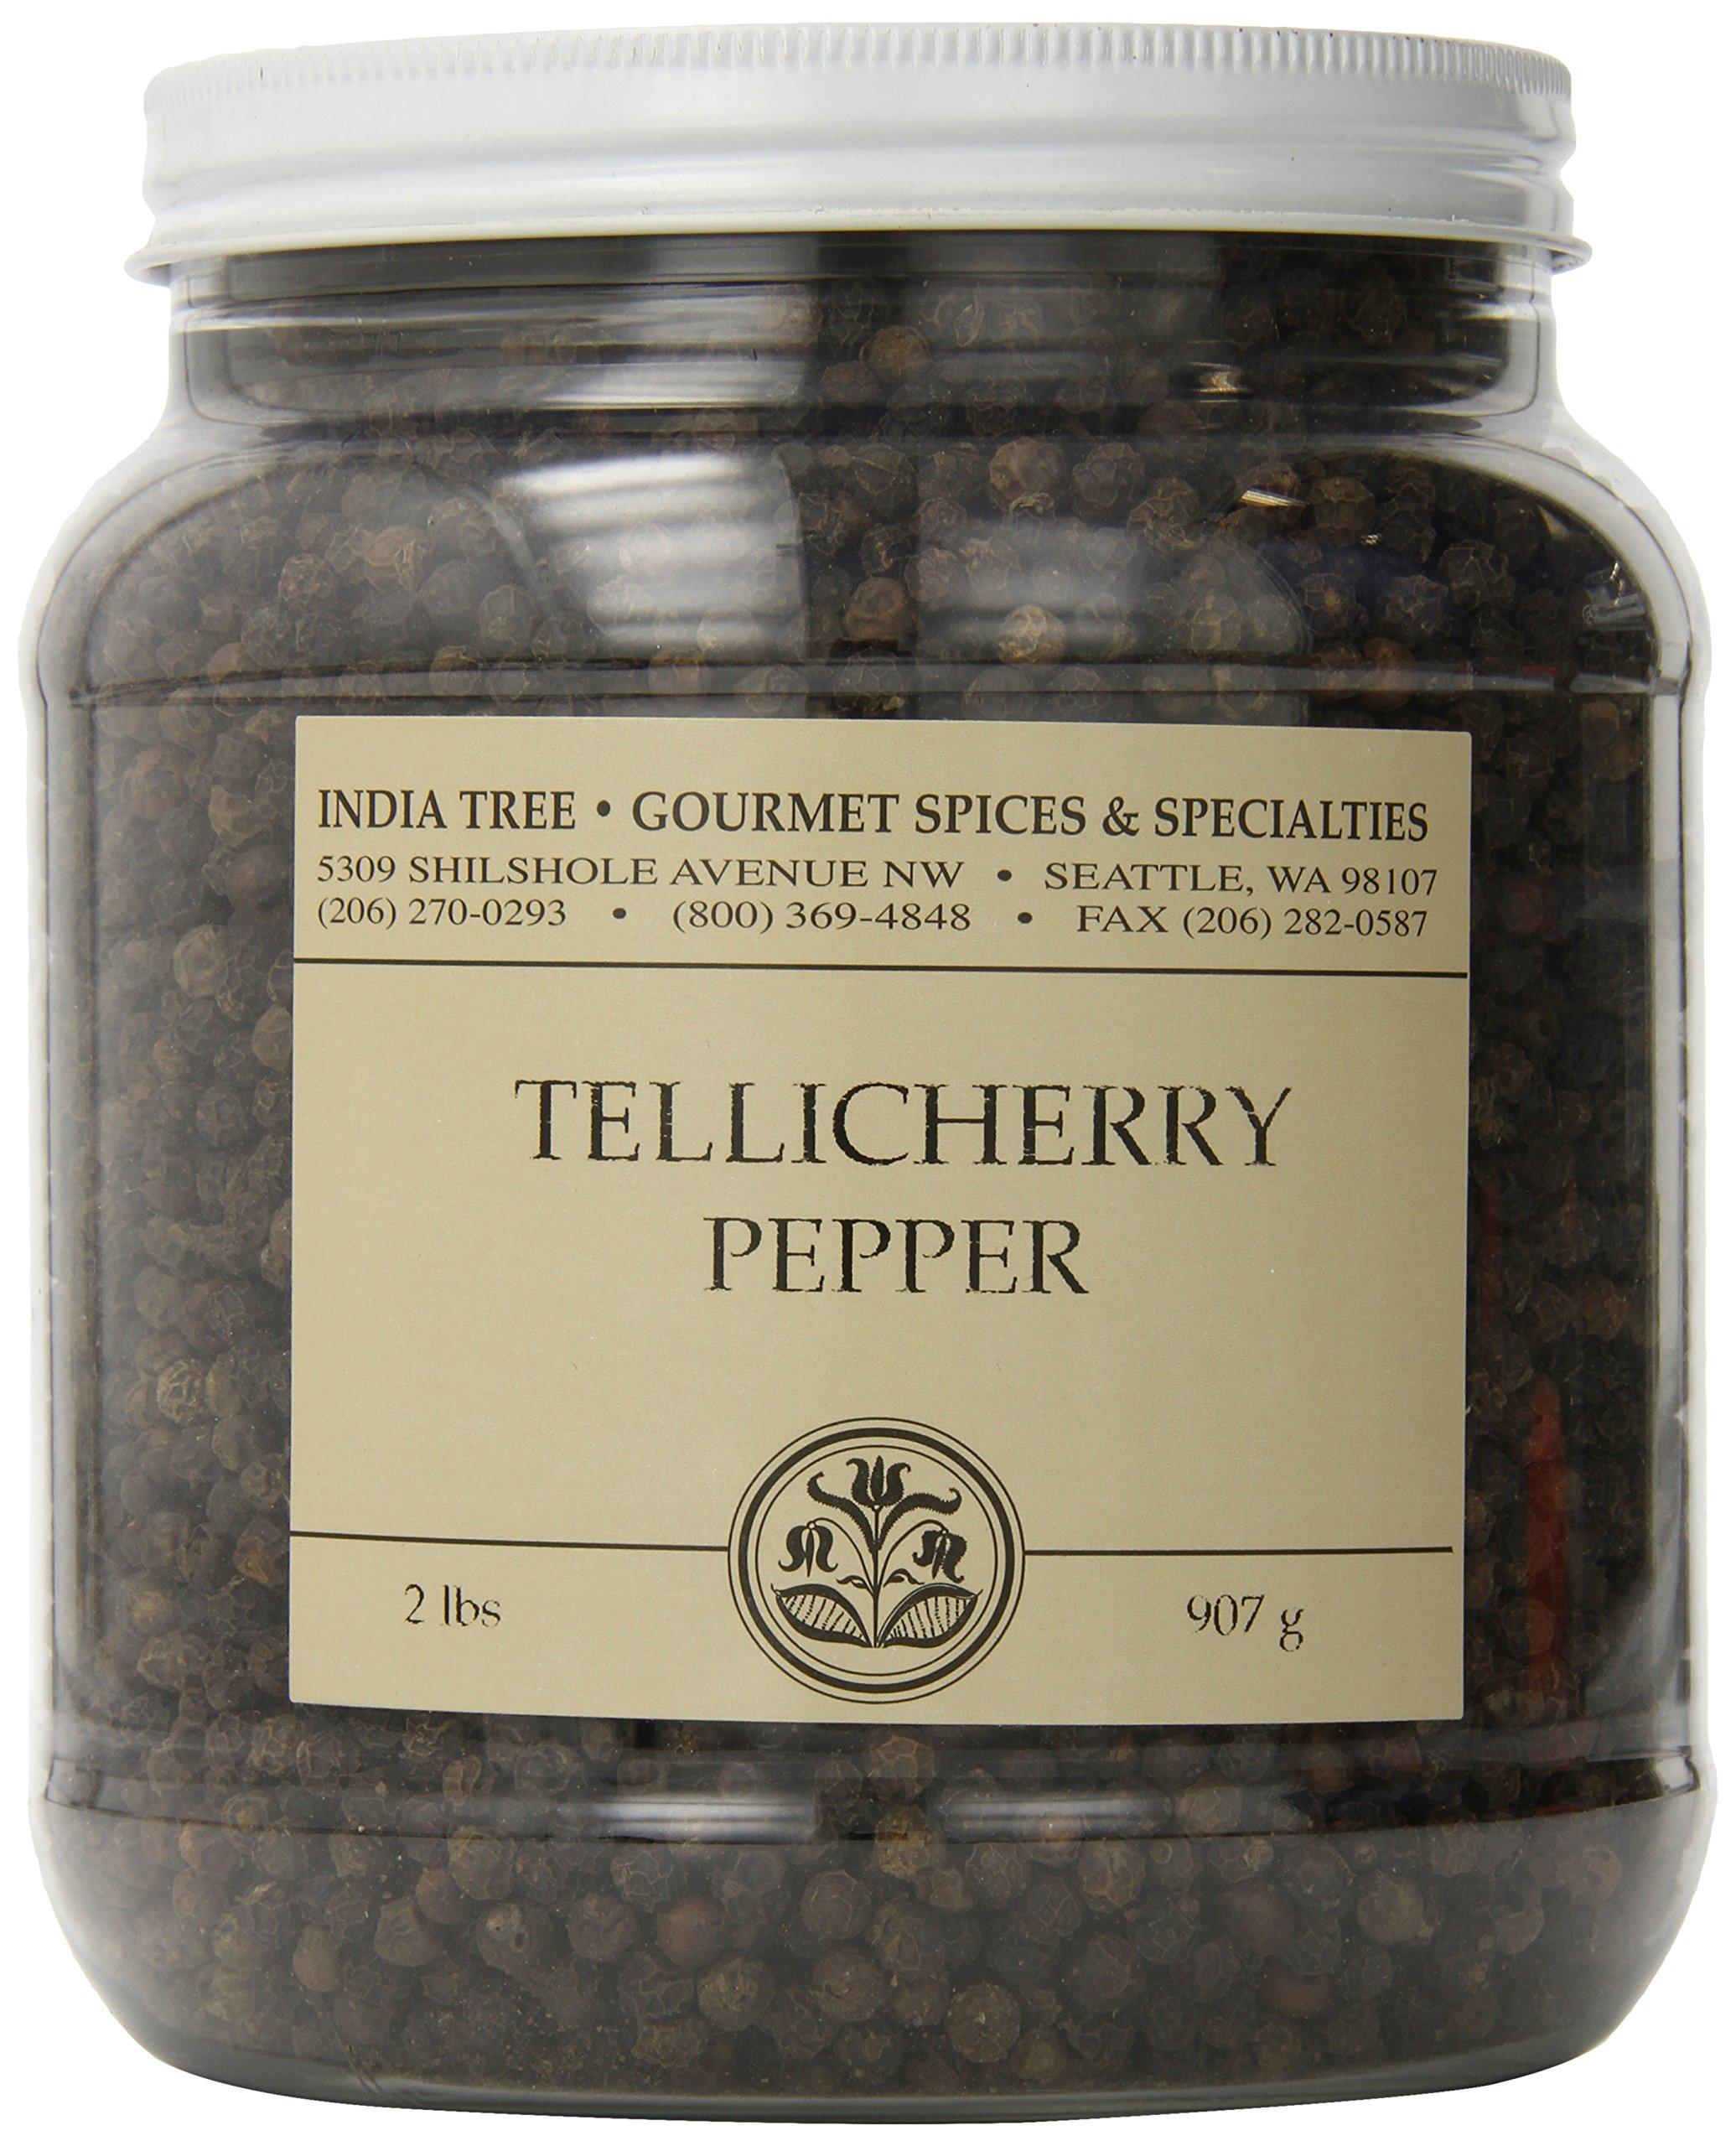 India Tree Tellicherry Pepper, 2 lb